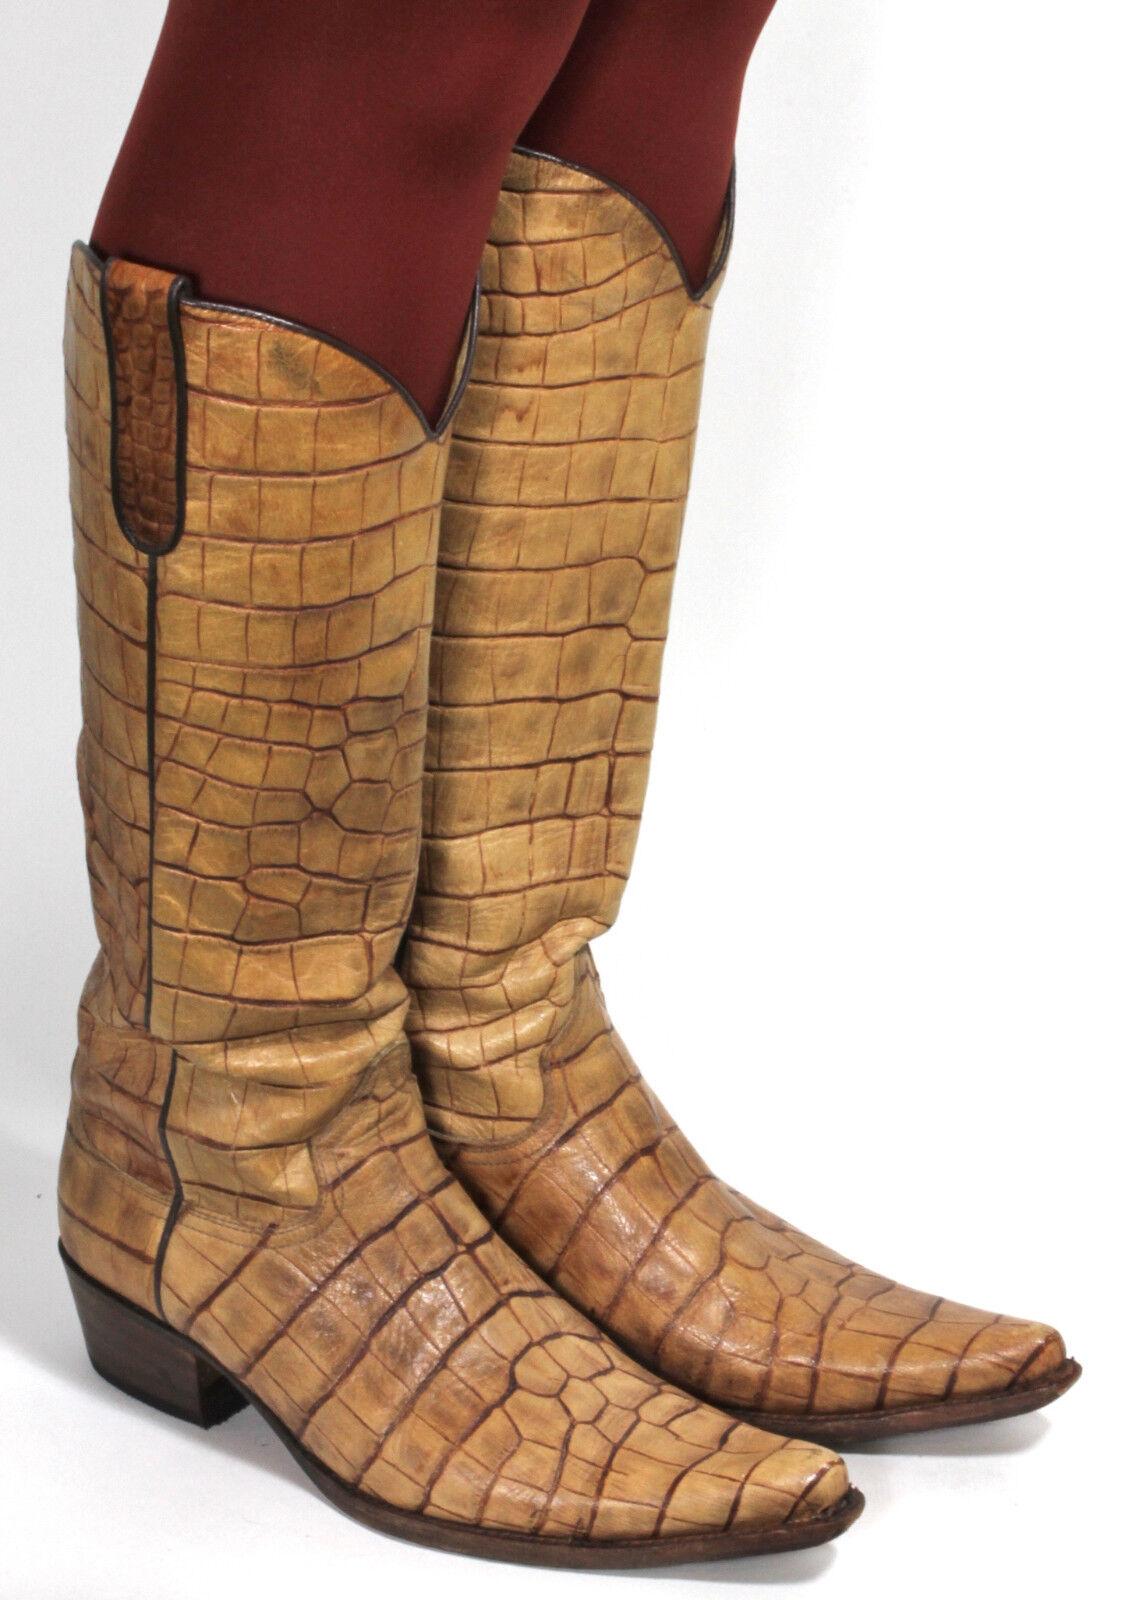 Stivali Western Cowboy Stivali Catalan Style line dance Texas Stivali Sendra 39